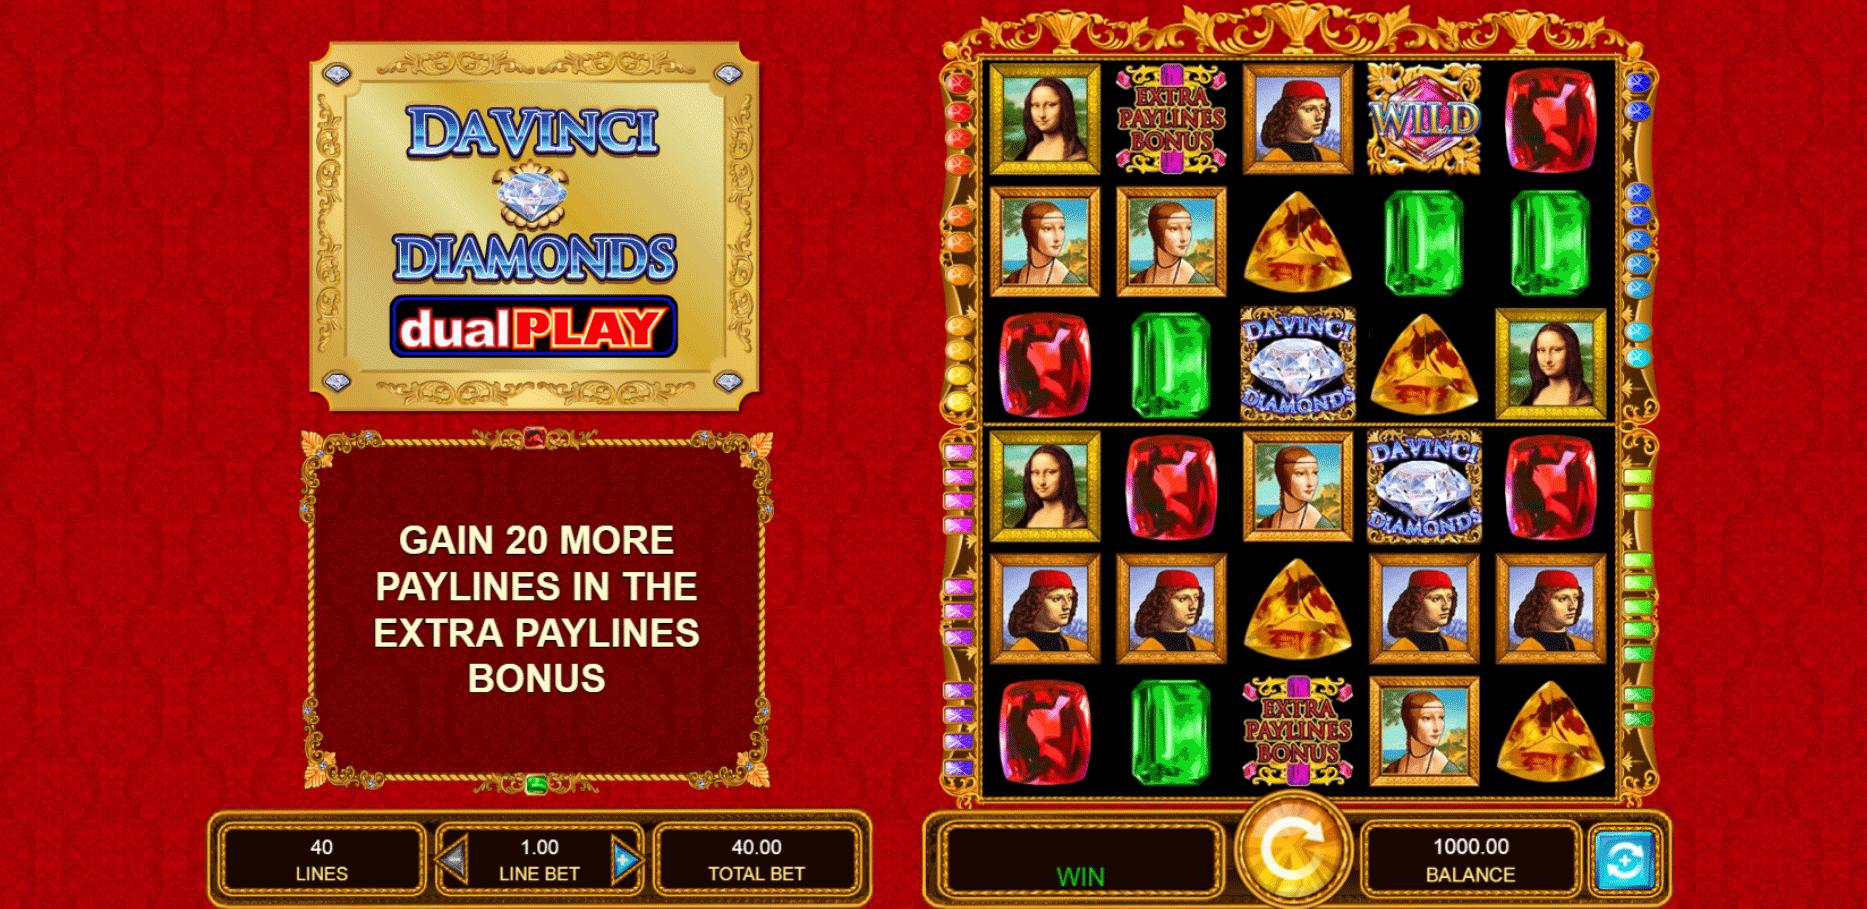 Slot Da Vinci Diamonds Dual Play